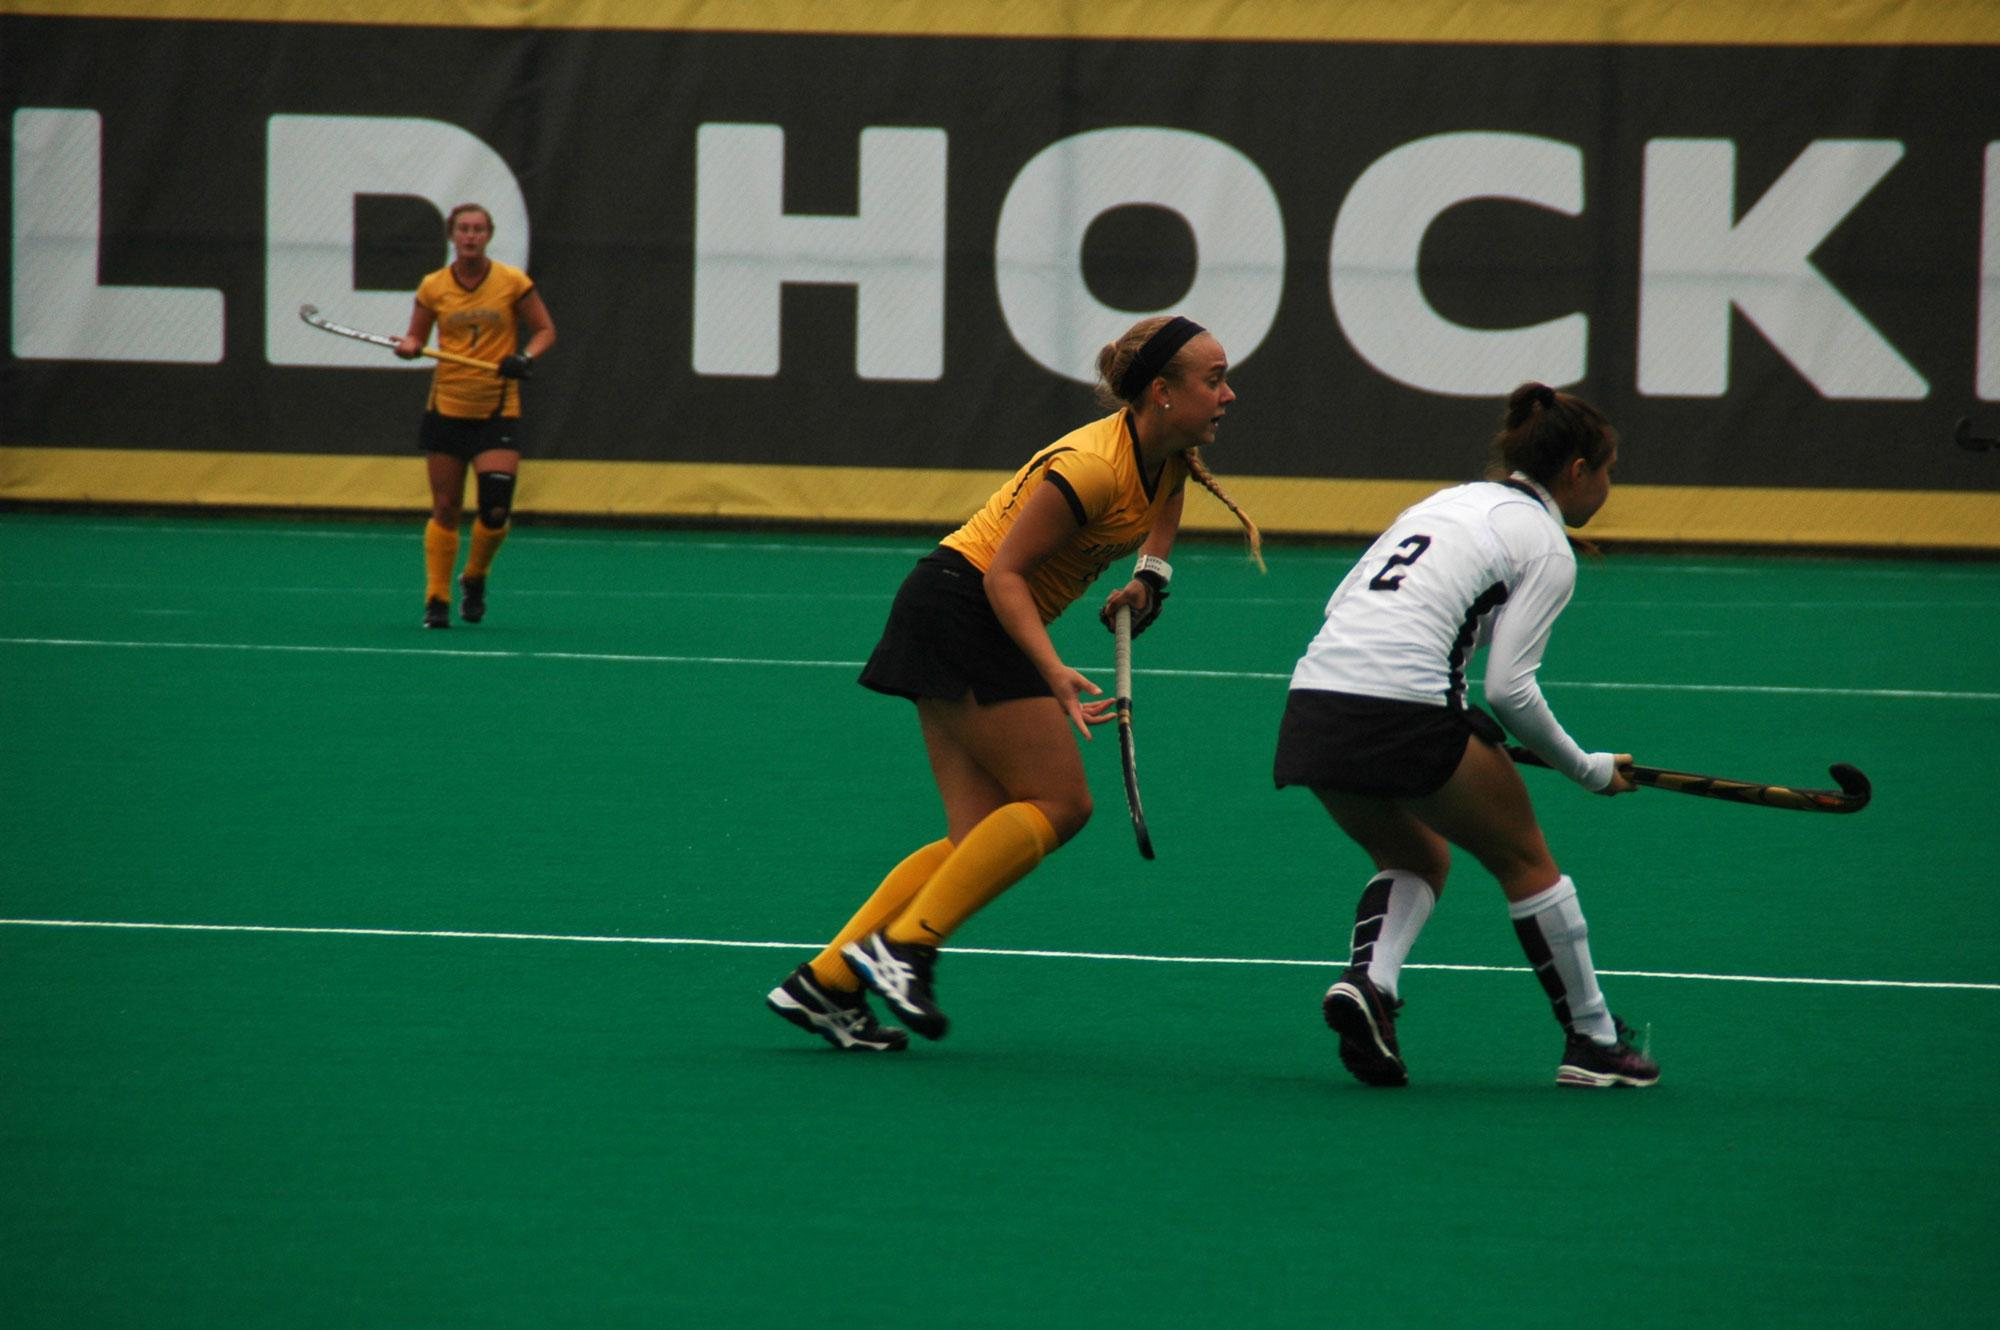 FieldHockey_06_LindseyHonkomp_Web